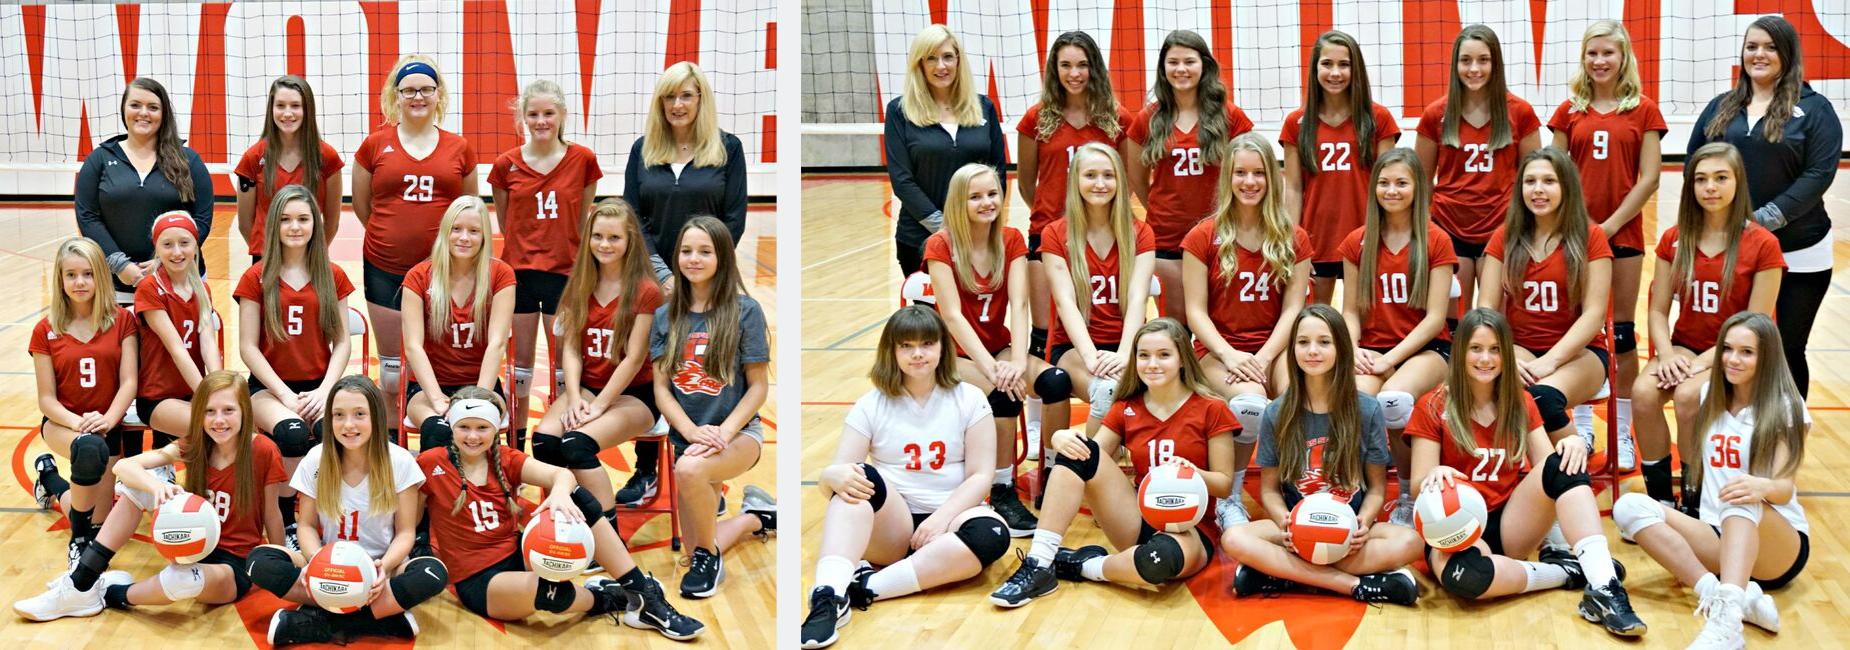 RSMS Volleyball Teams